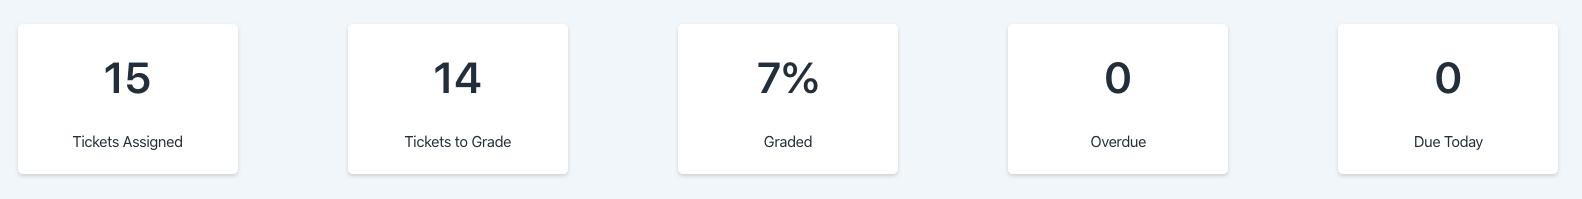 overall metrics